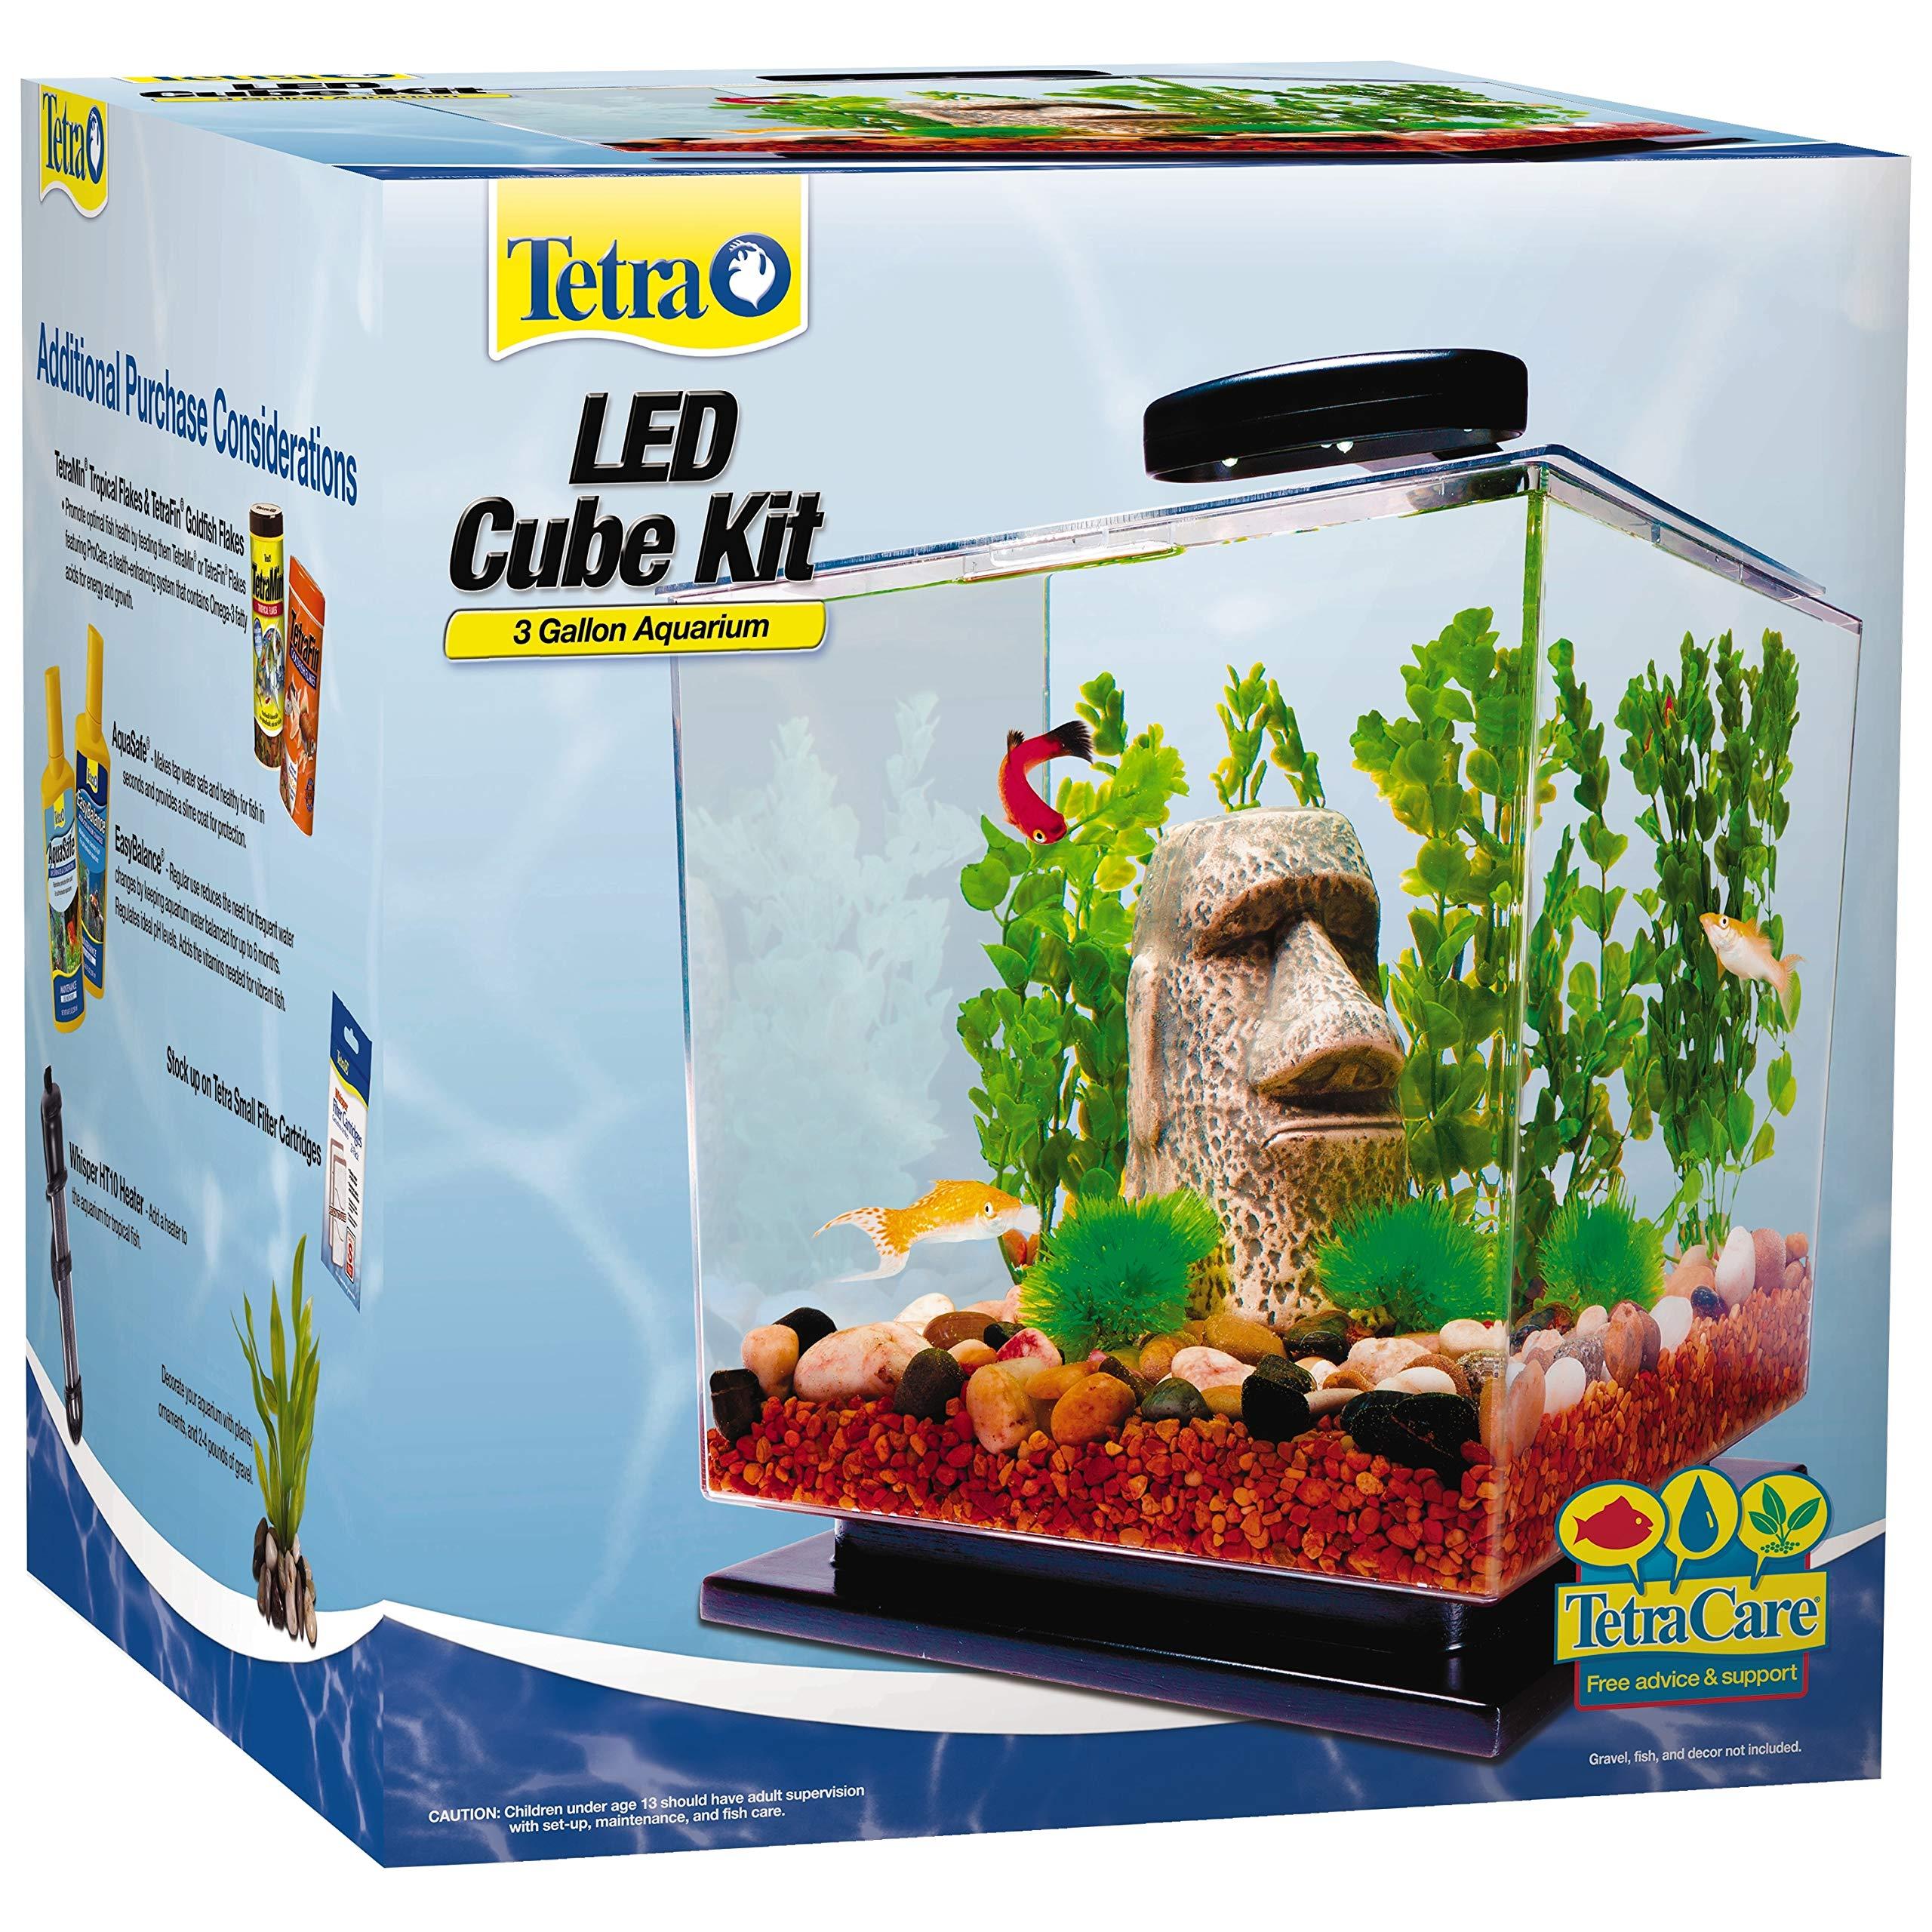 Tetra LED Cube Shaped 3 Gallon Aquarium with Pedestal Base by Tetra